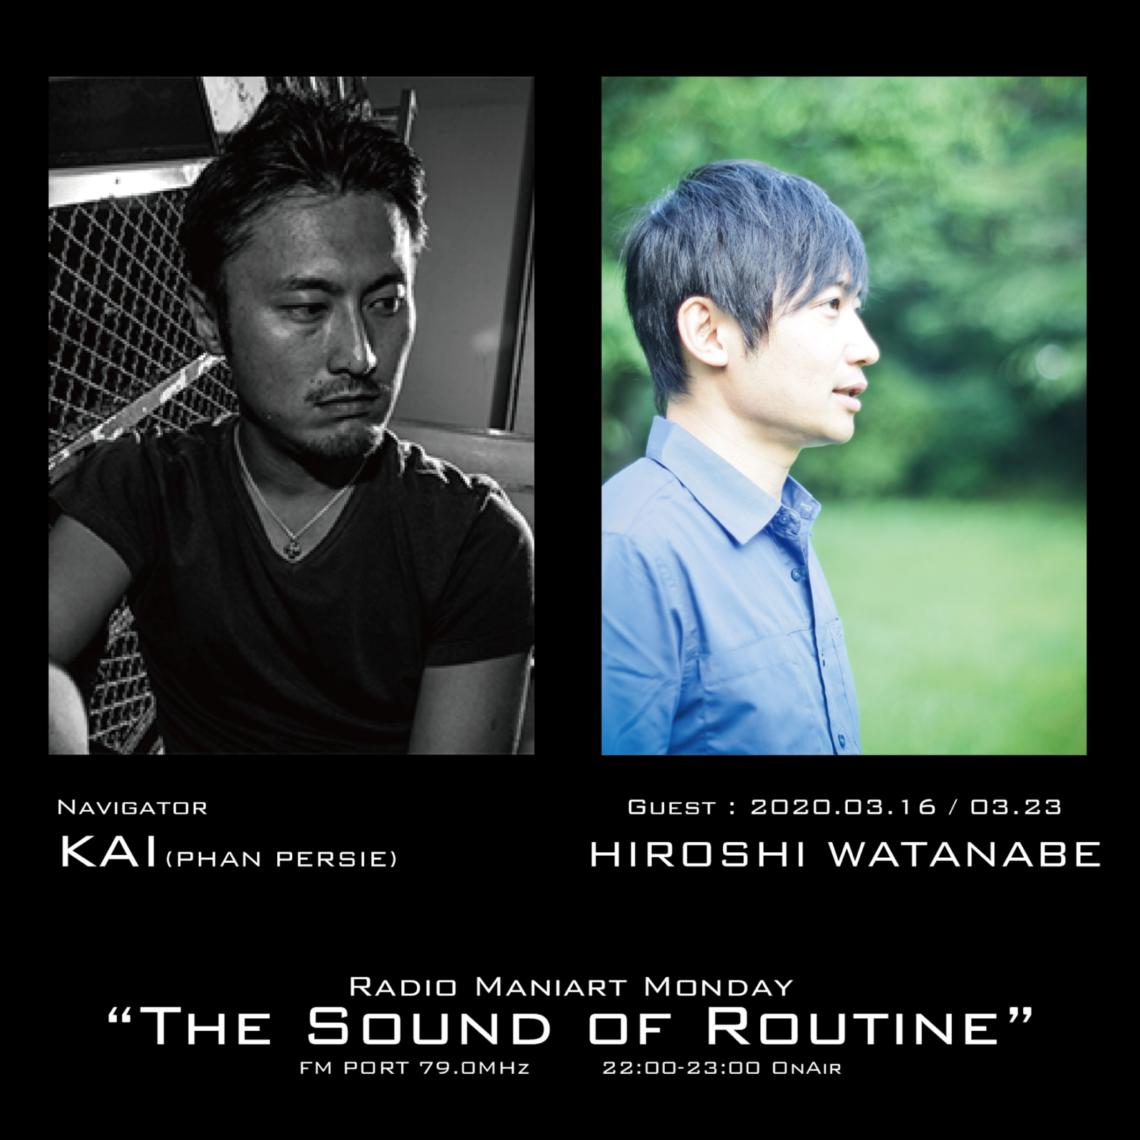 2020. 3. 16 MON, 3. 23 MON – KAI : Navigator on FM PORT / the Sound of Routine – Guest : HIROSHI WATANABE